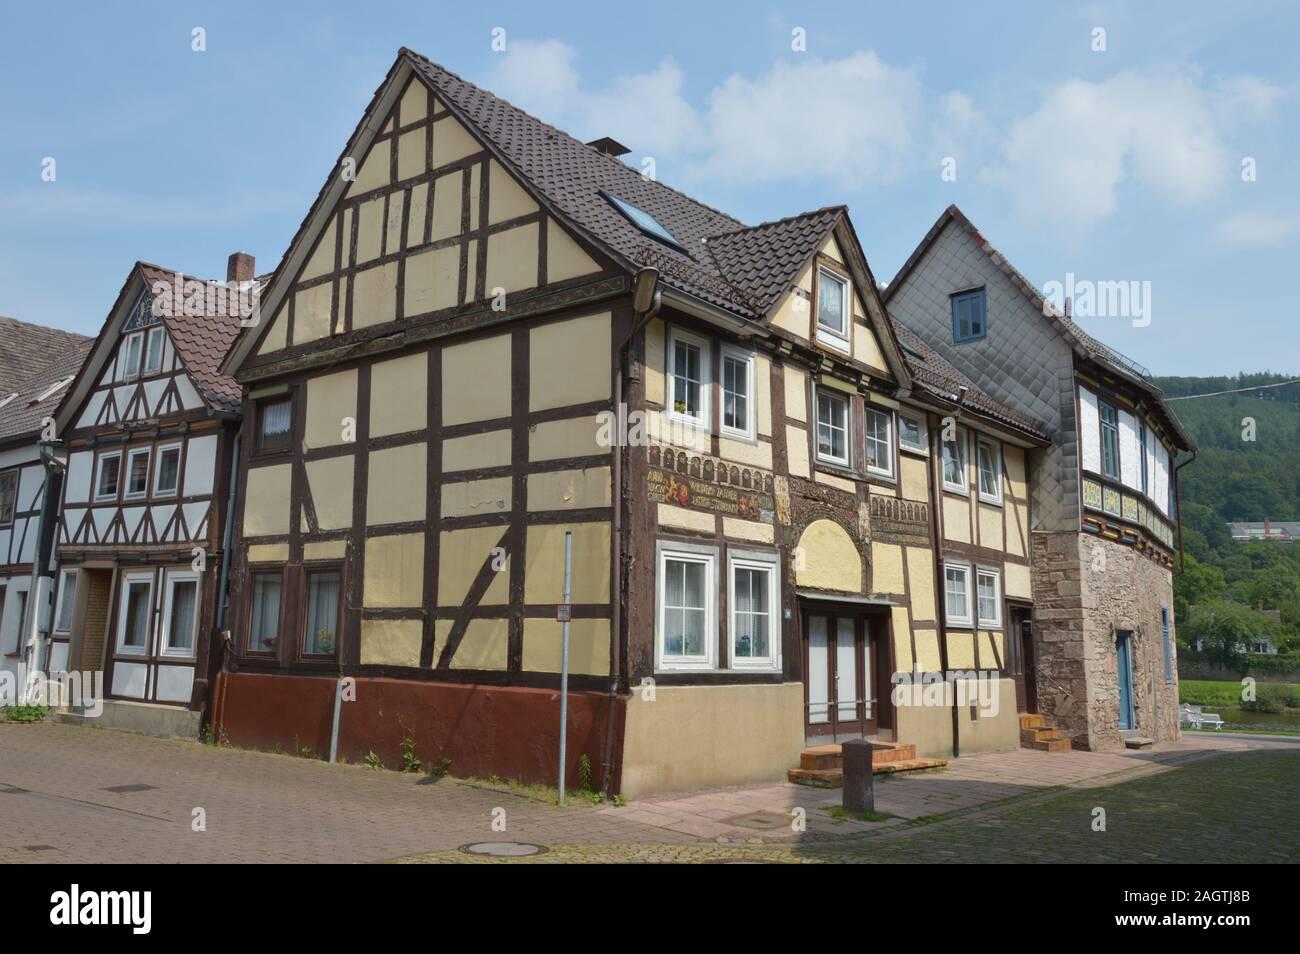 Ciudad Munchhausen Bodenwerder, Alemania Foto de stock